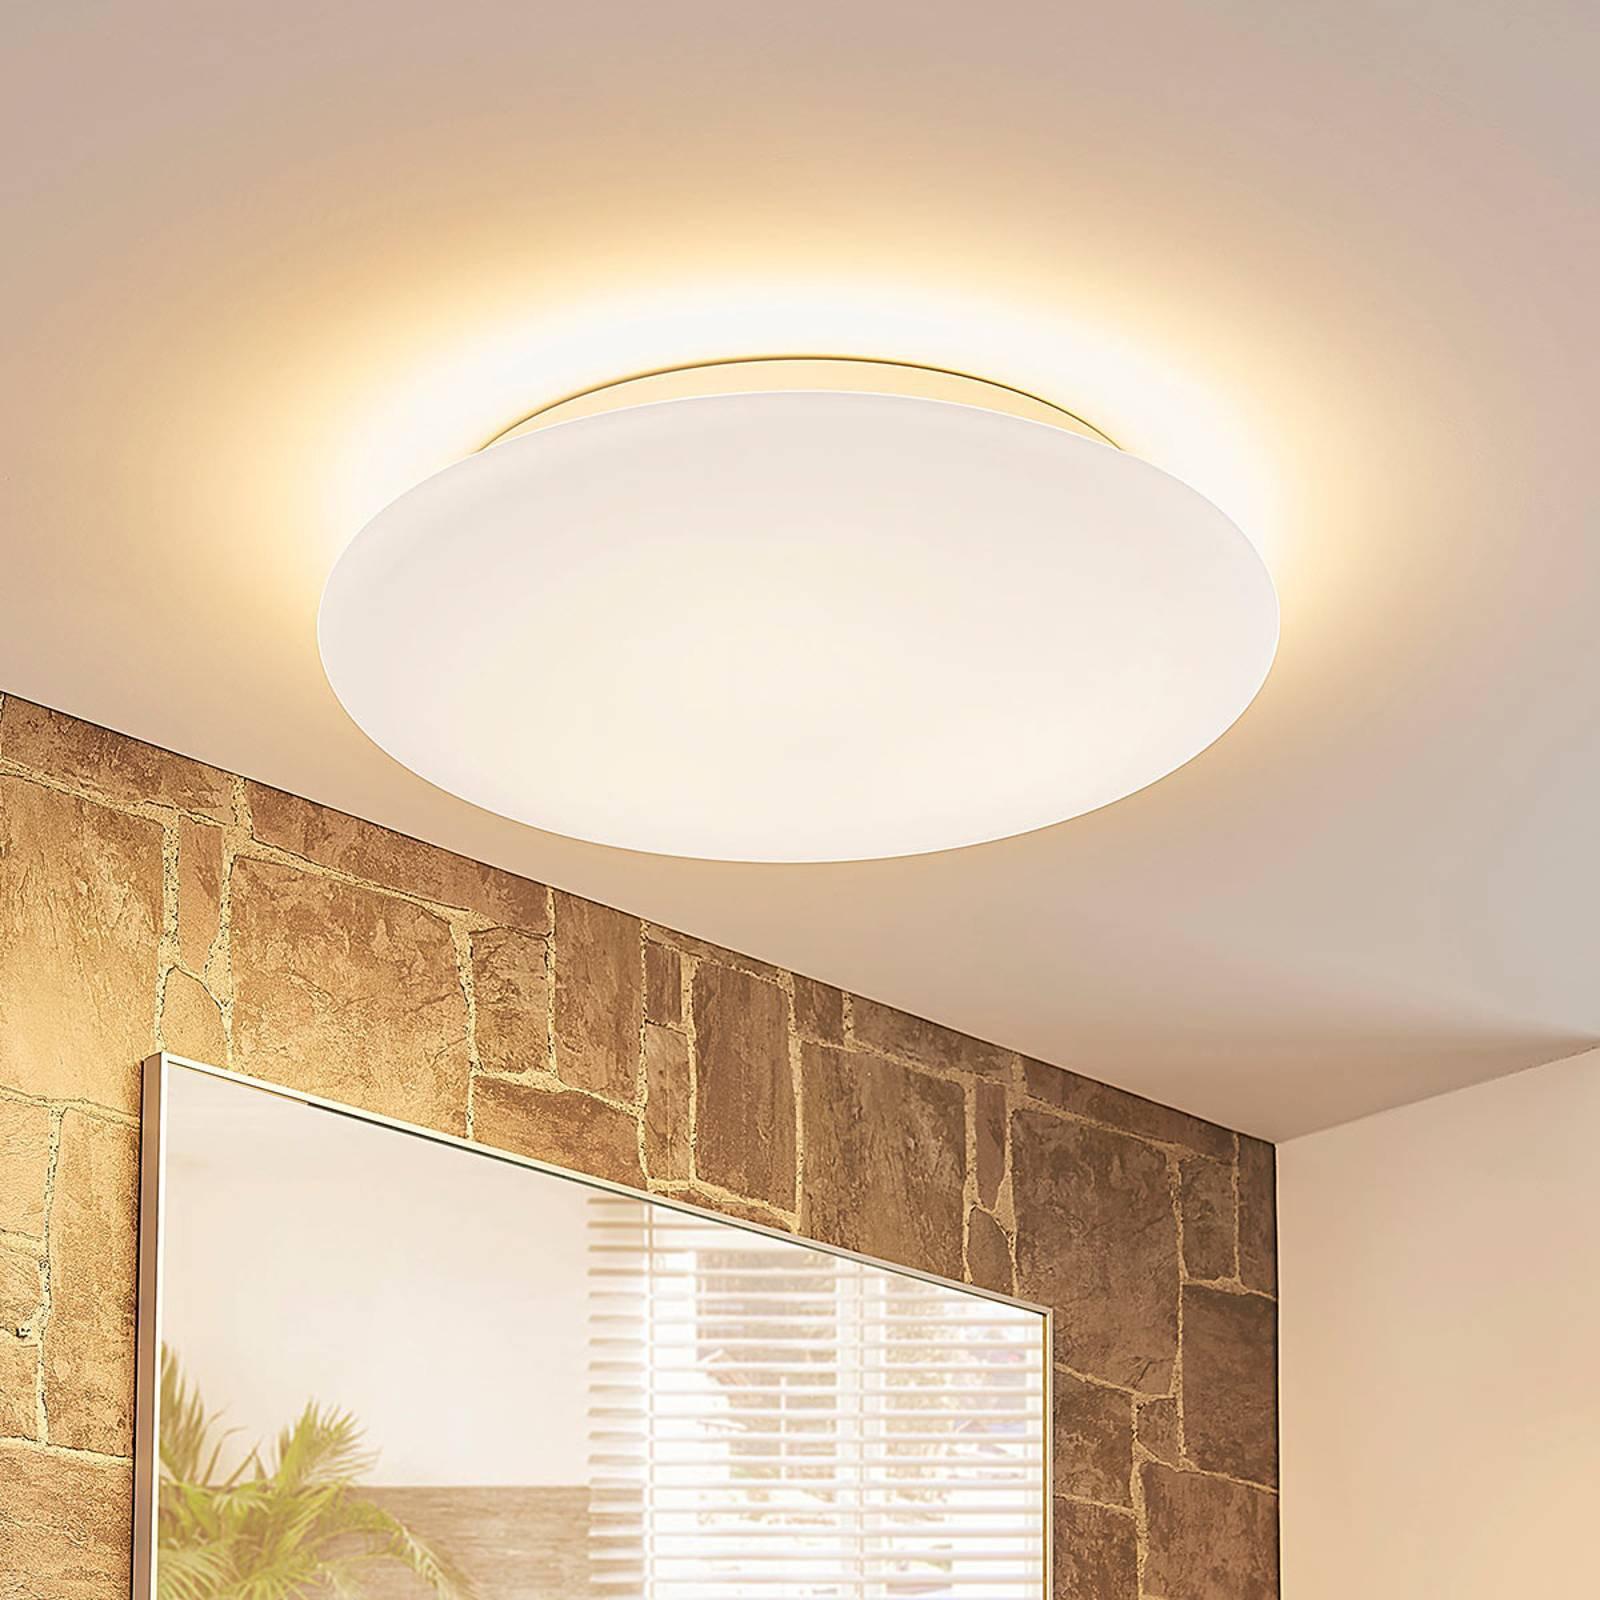 Dimbar LED-taklampe i tre trinn Toan, IP44